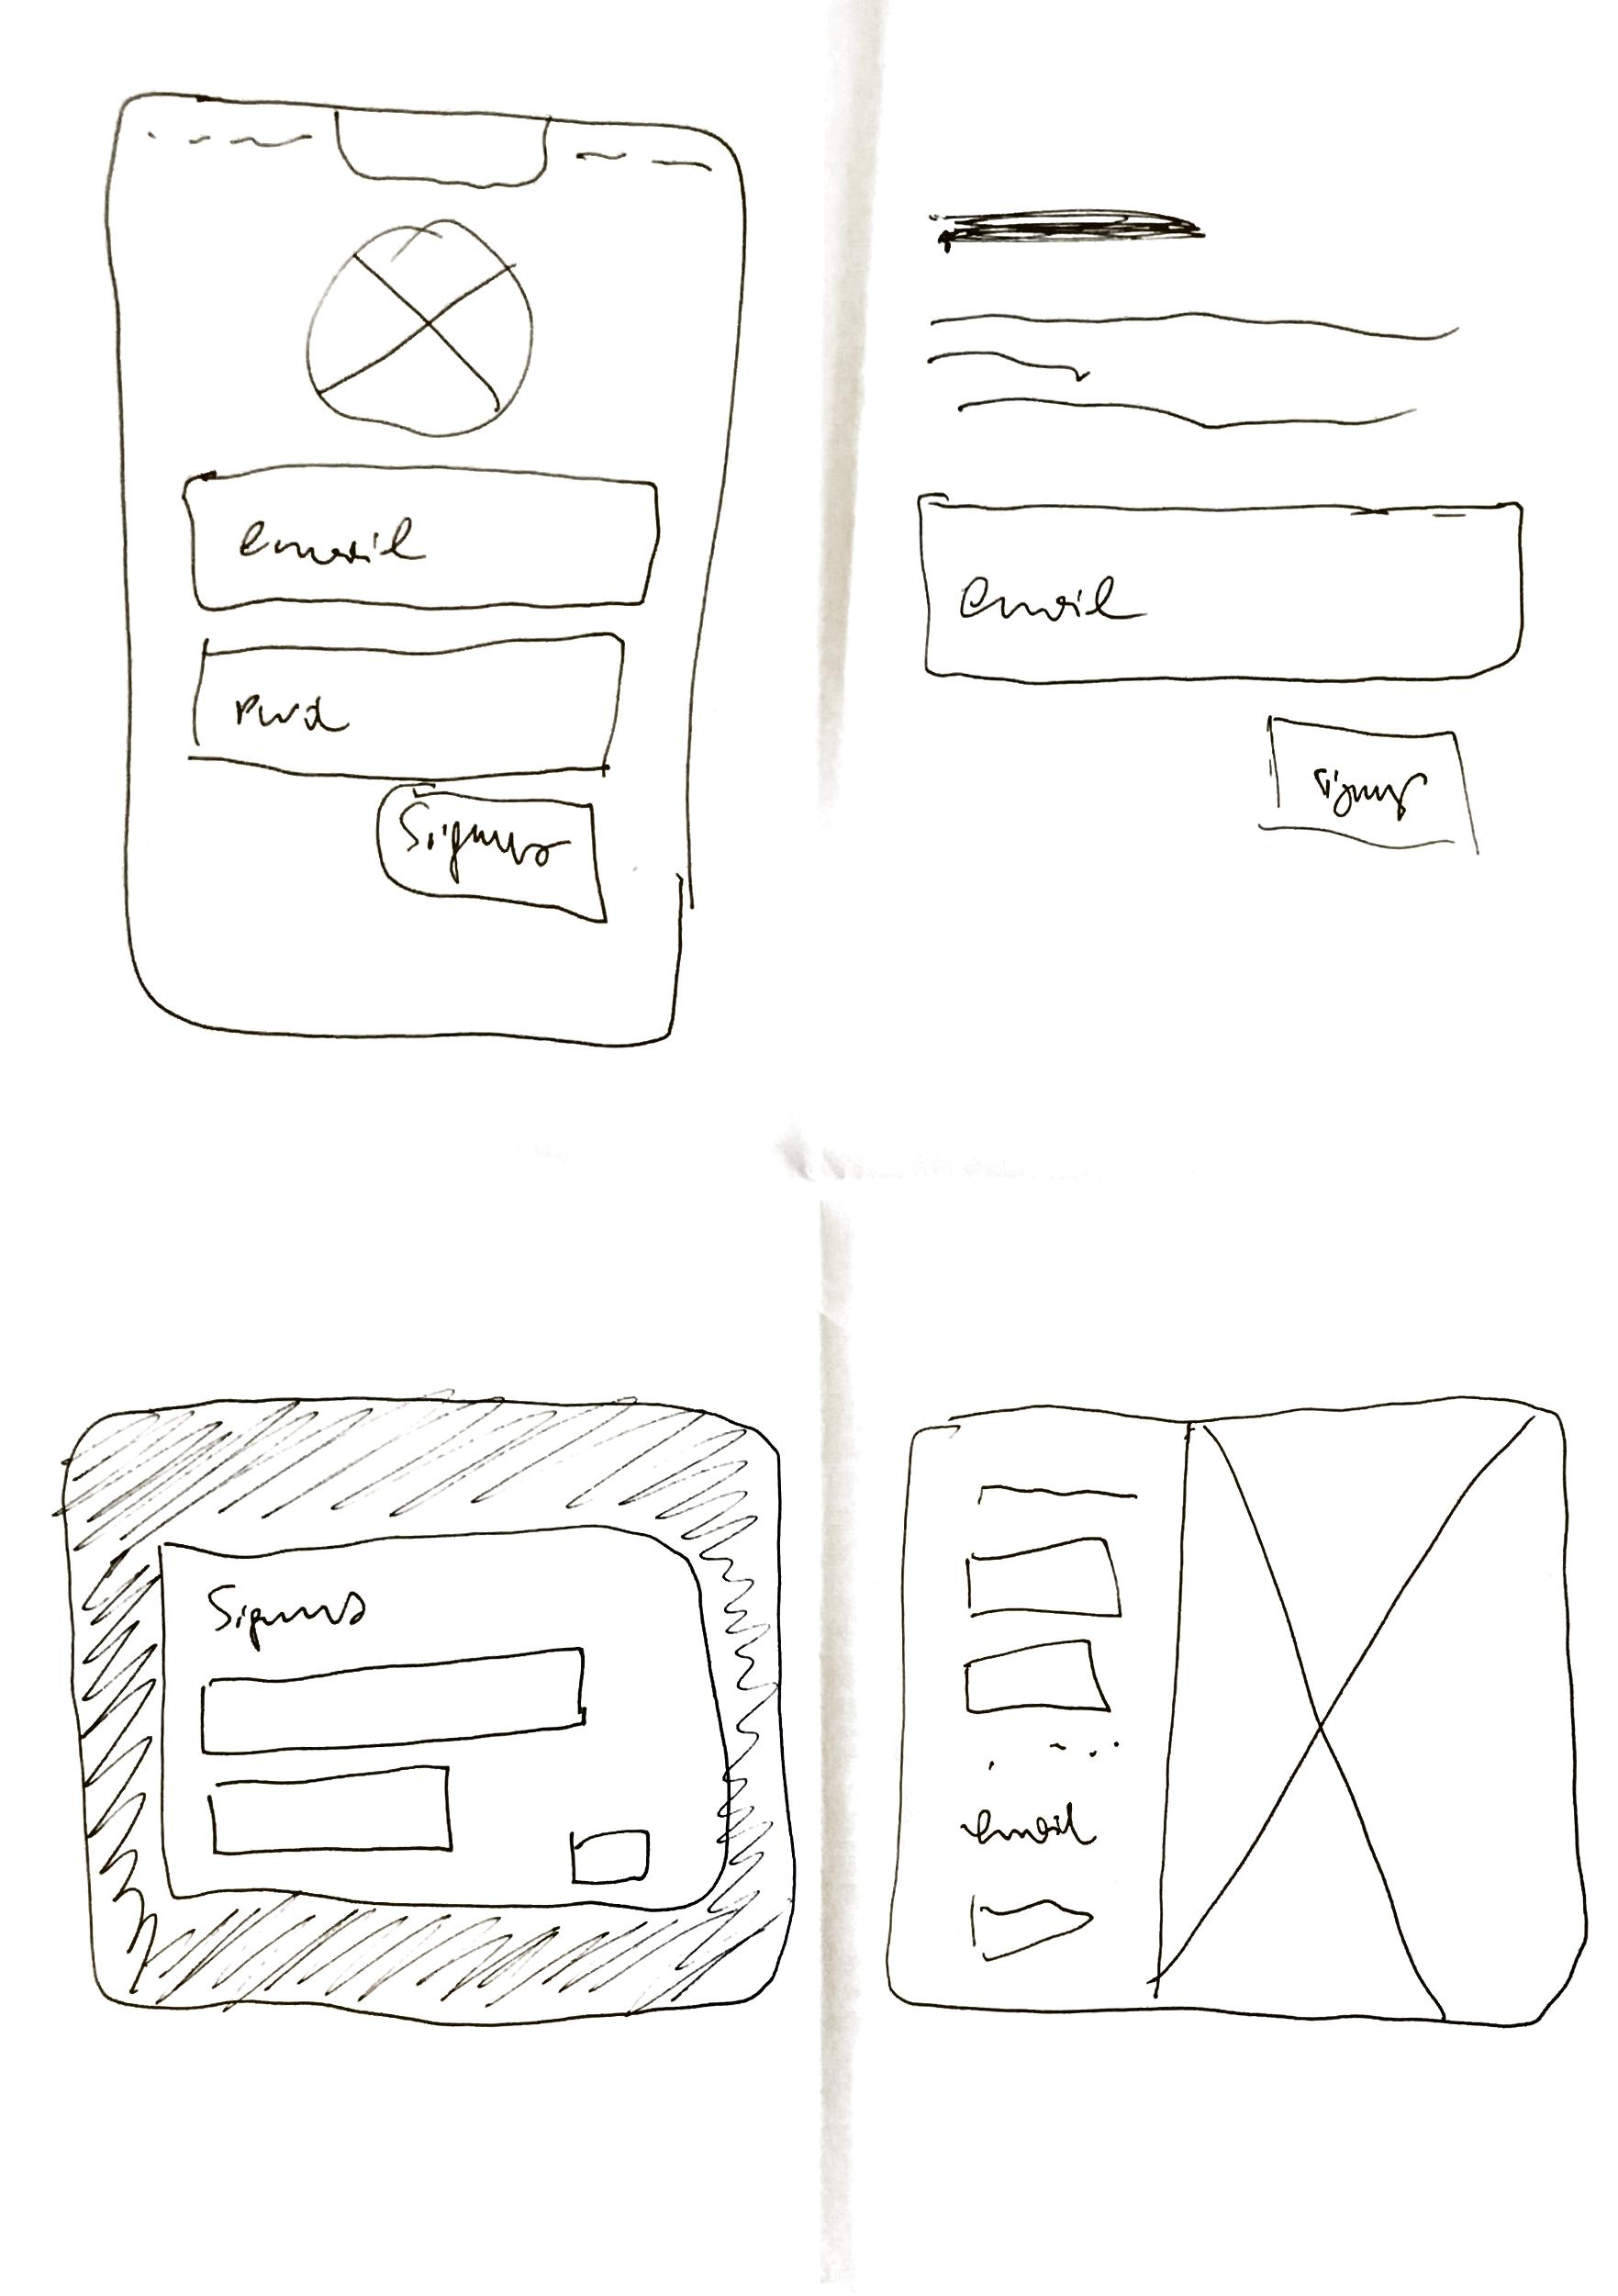 Daily001 idea wireframe